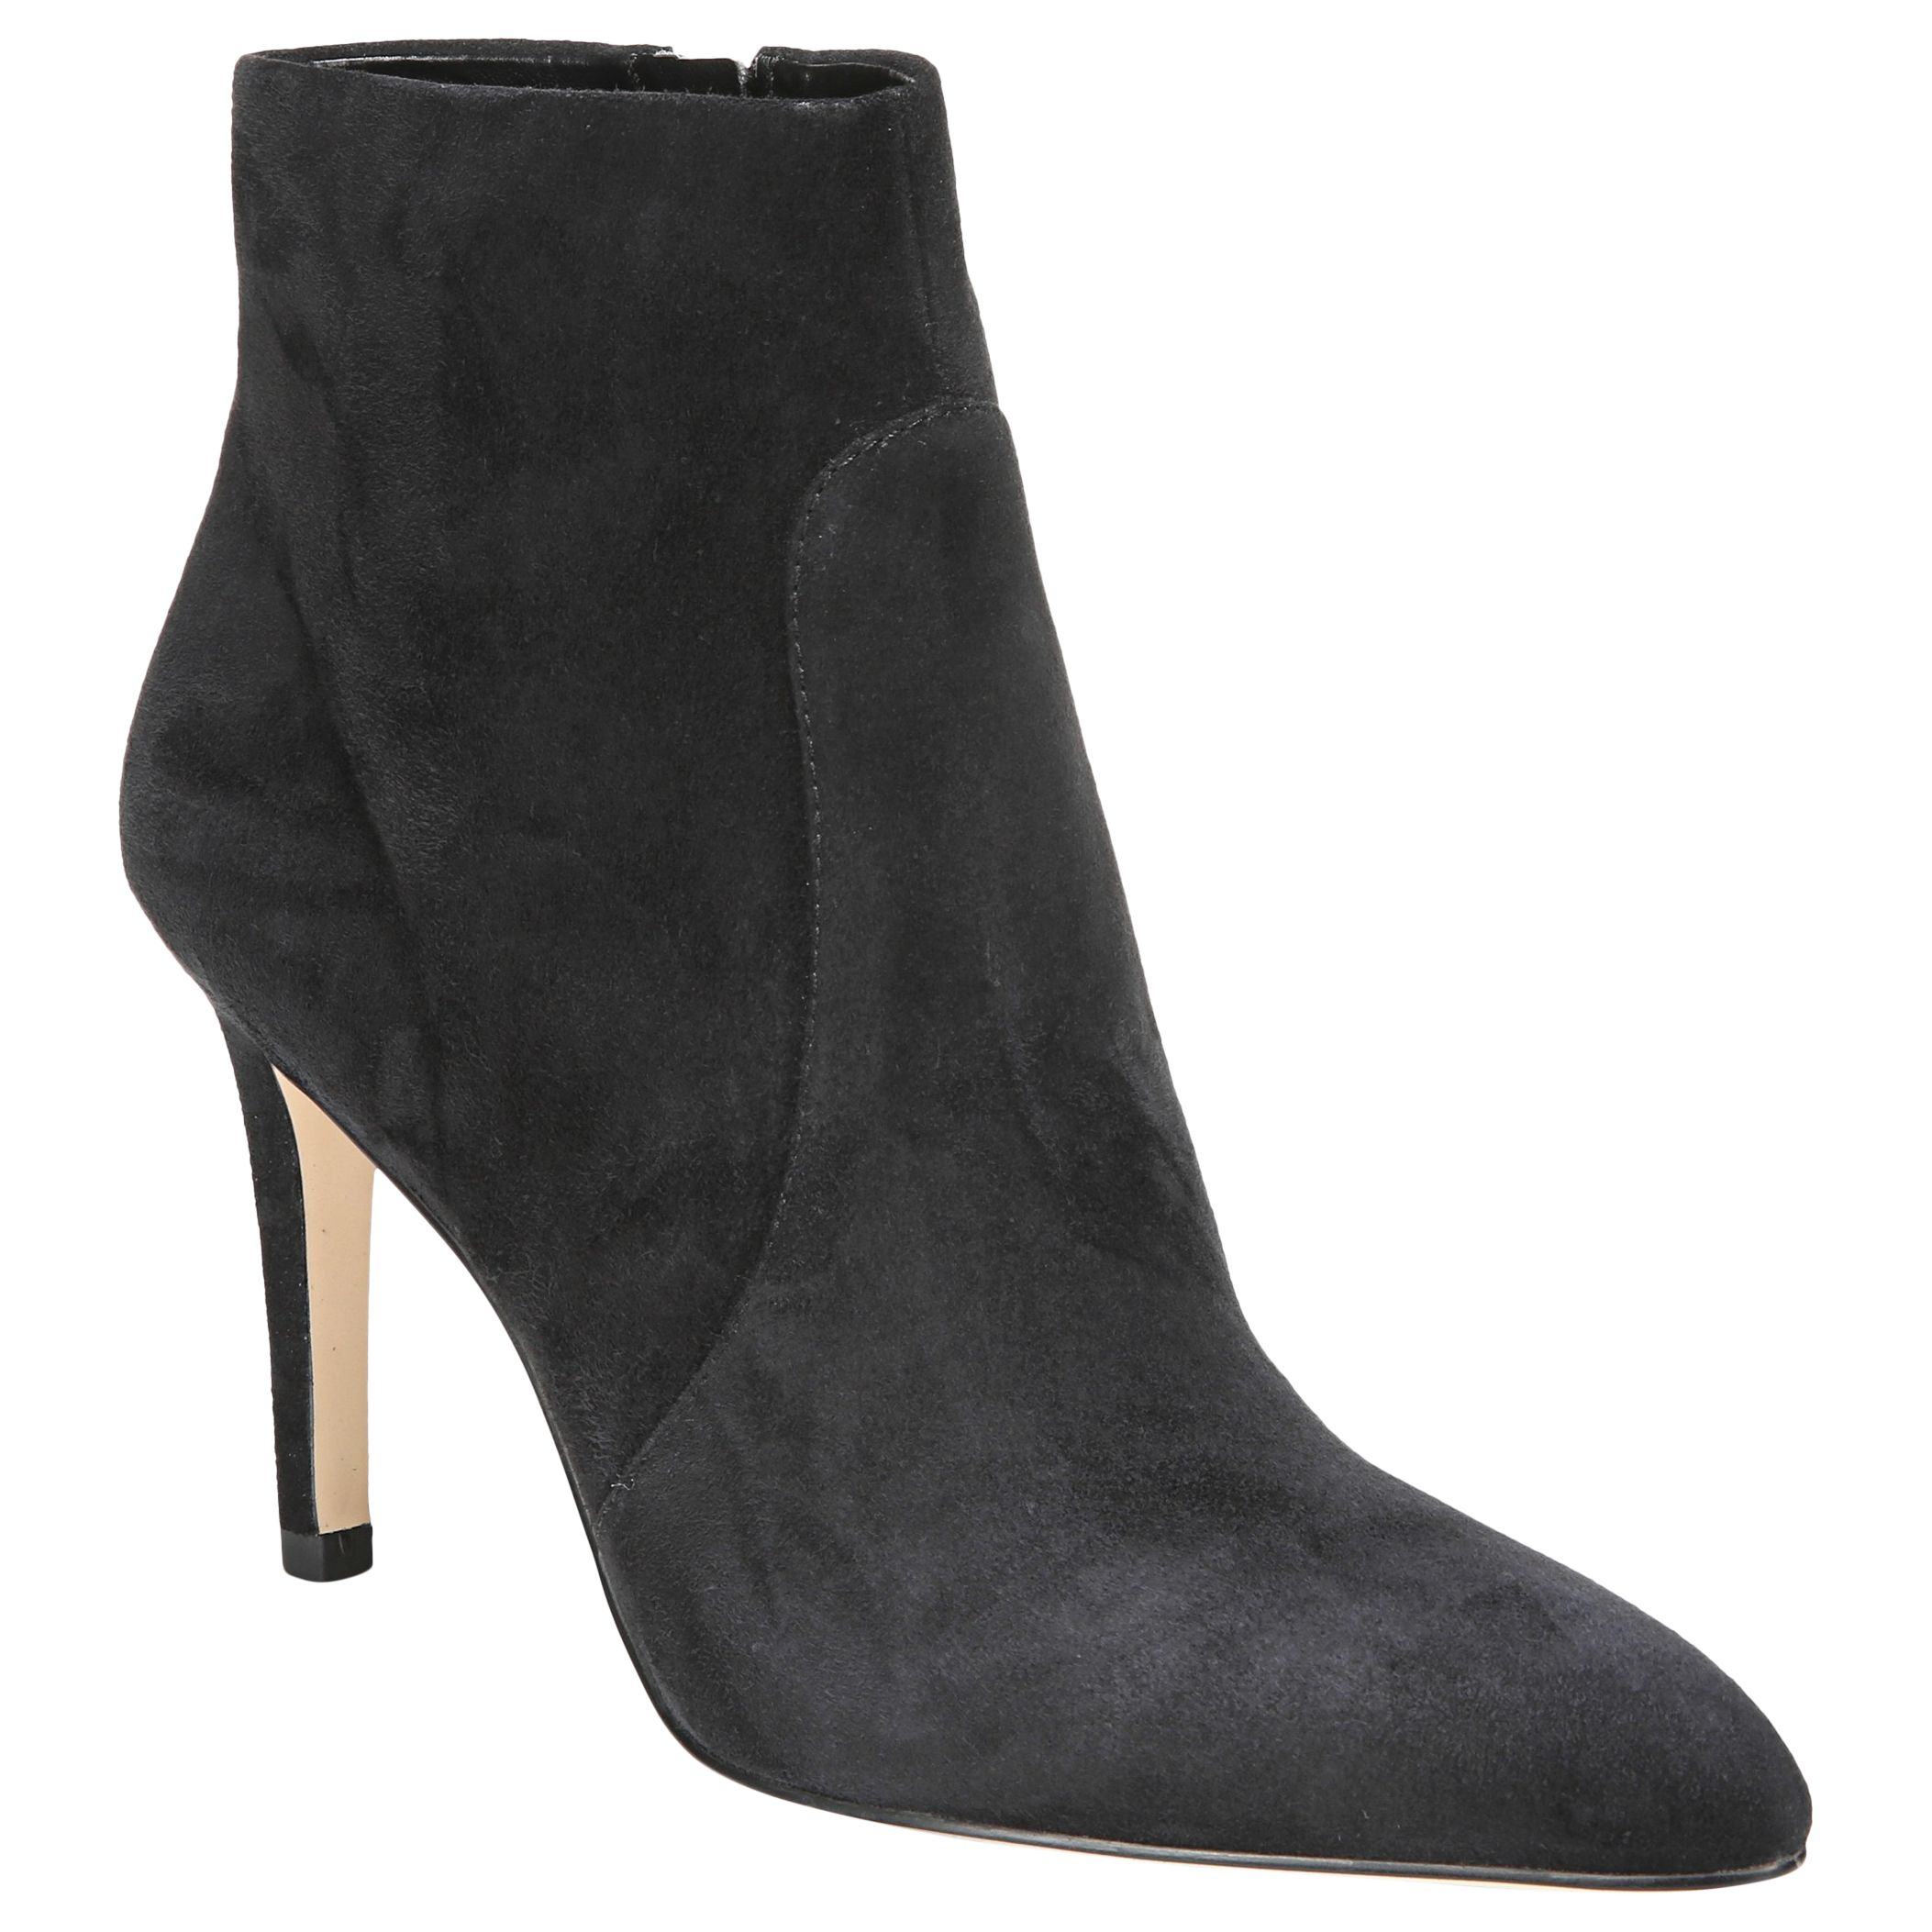 6f5f3b7e5c7f85 Sam Edelman Olette Stiletto Heeled Ankle Boots